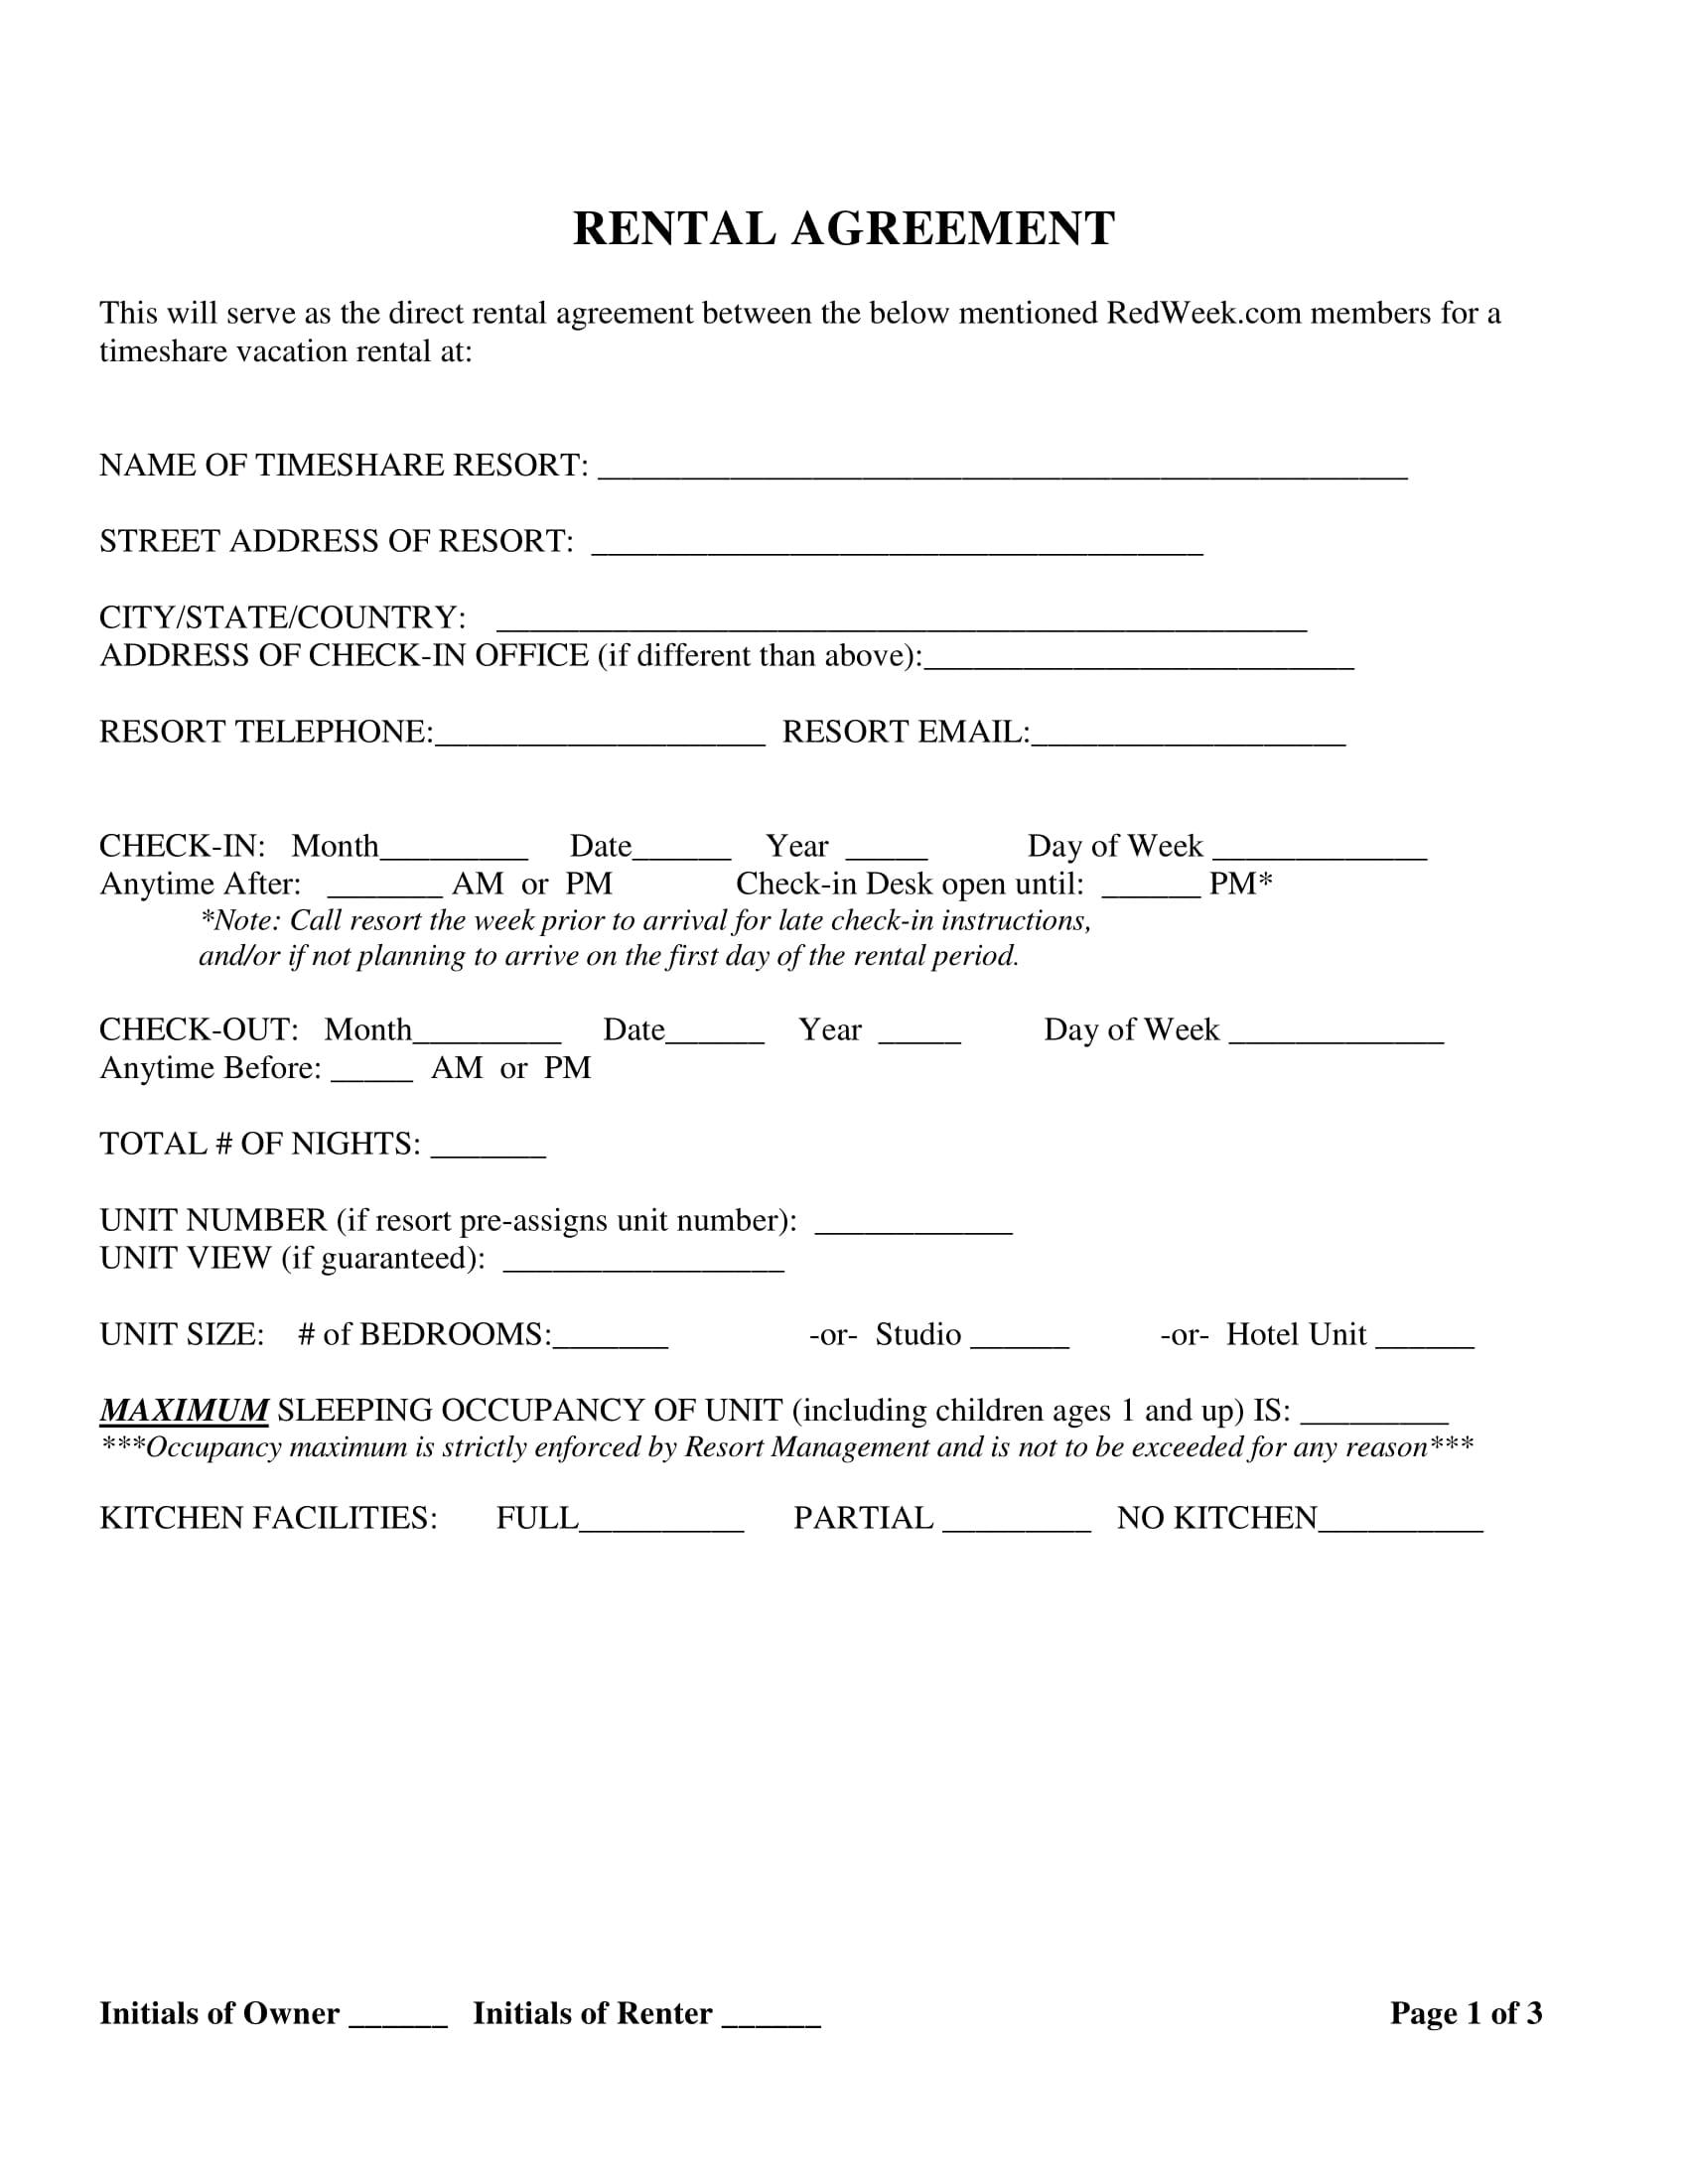 rw sample rental agreement